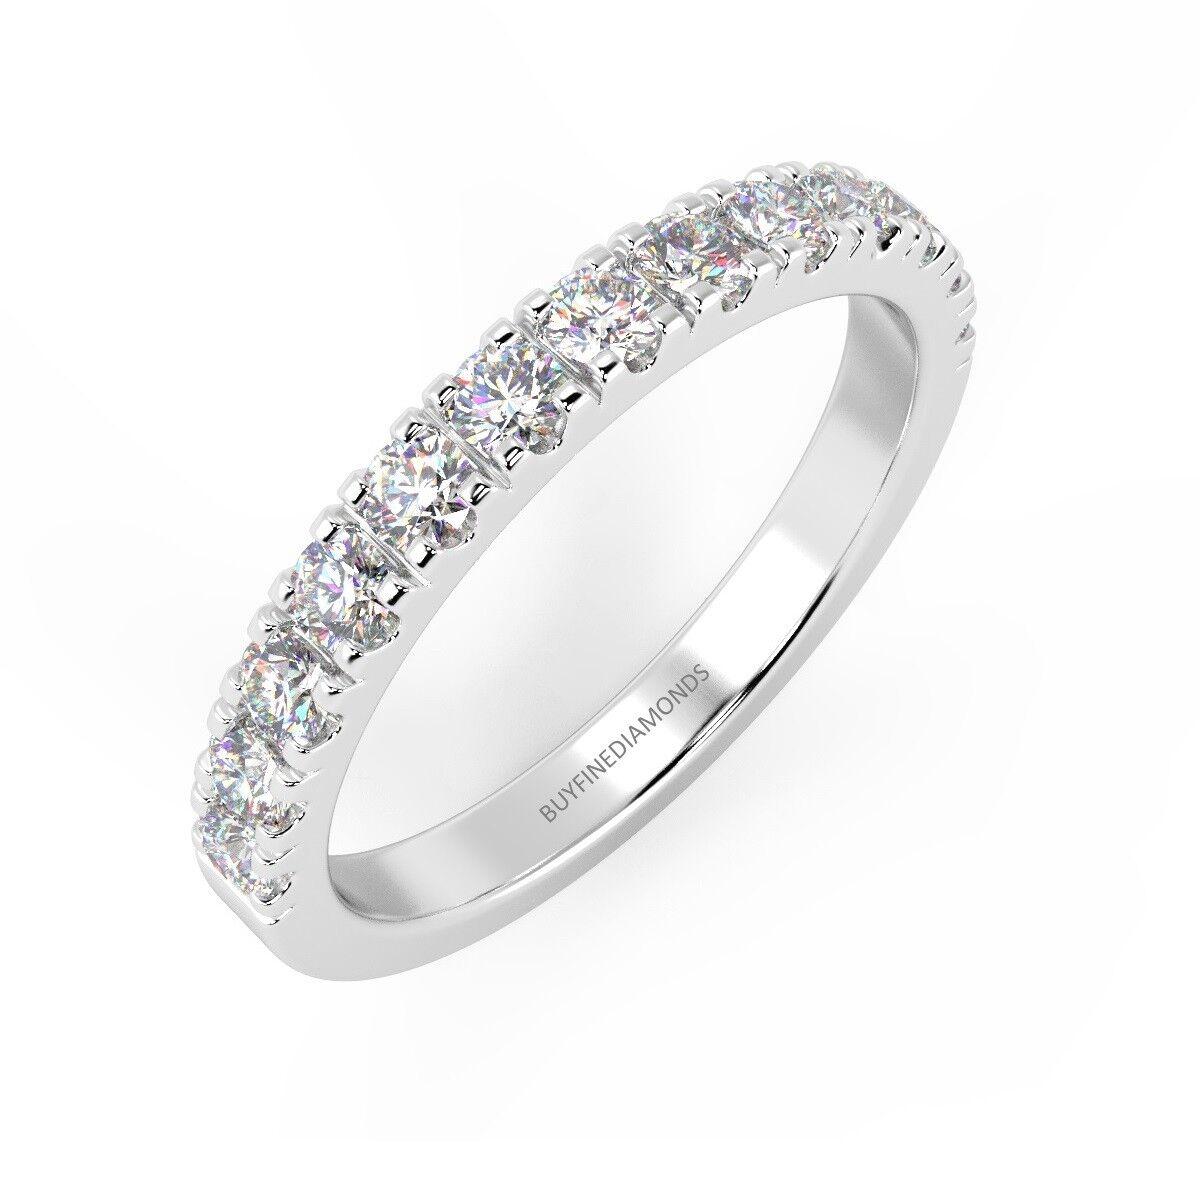 Top Quality 1 4Ct Round Diamond Micro Pave Set Half Eternity Ring, UK Hallmarked